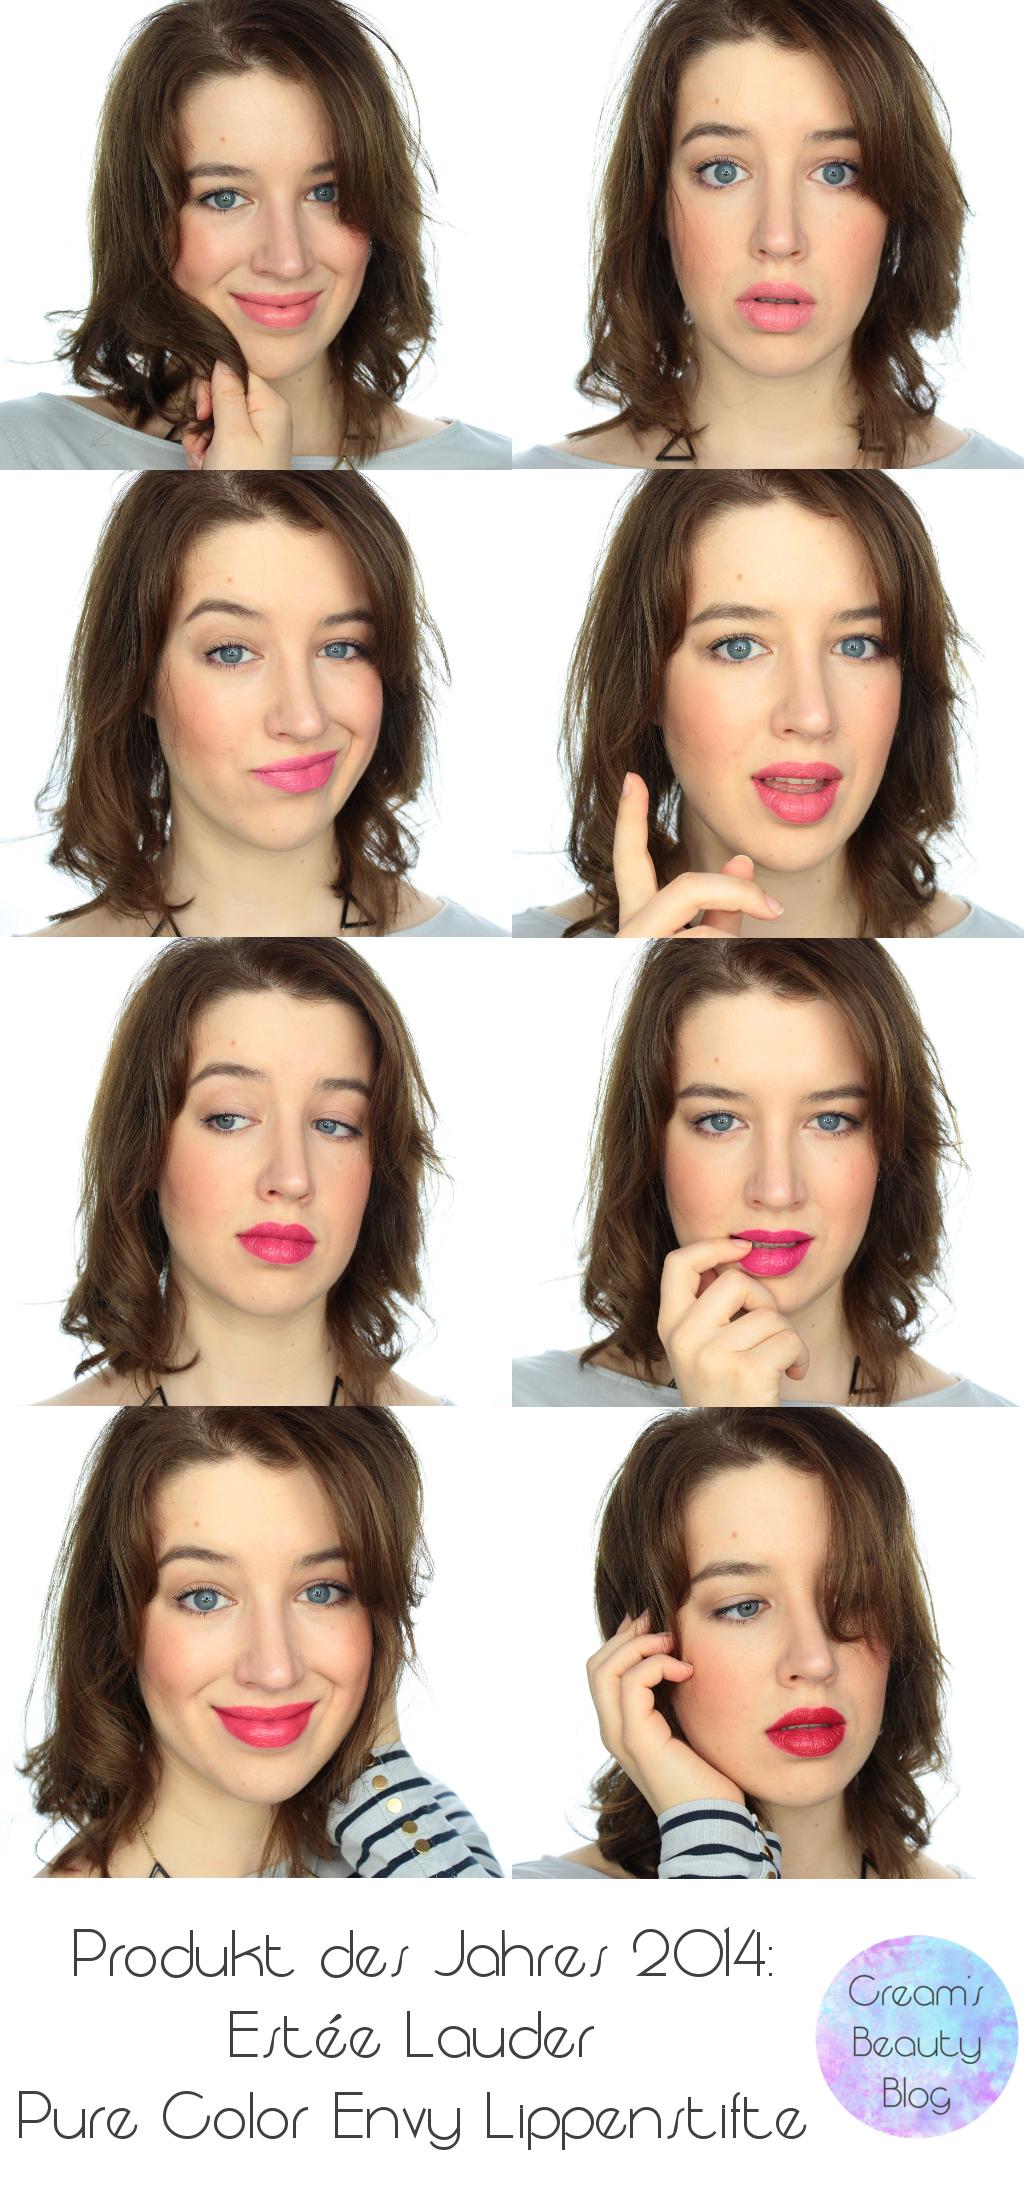 Estee Lauder Pure Color Envy Lippenstift Tragebild